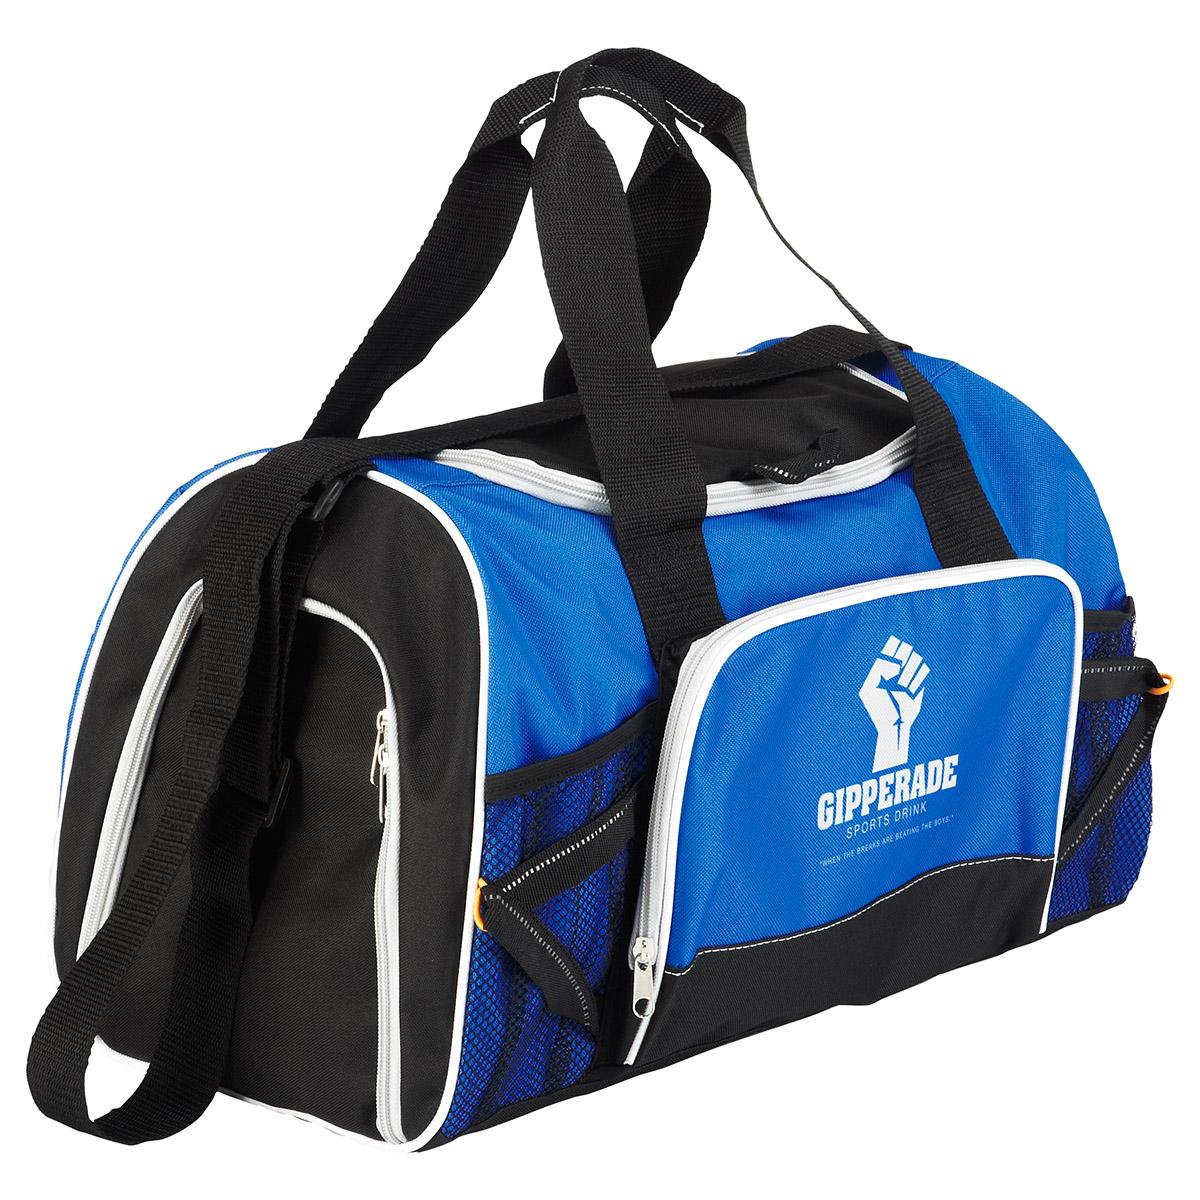 Marathon Sports Duffel Bag, WBA-MD10 - 1 Colour Imprint